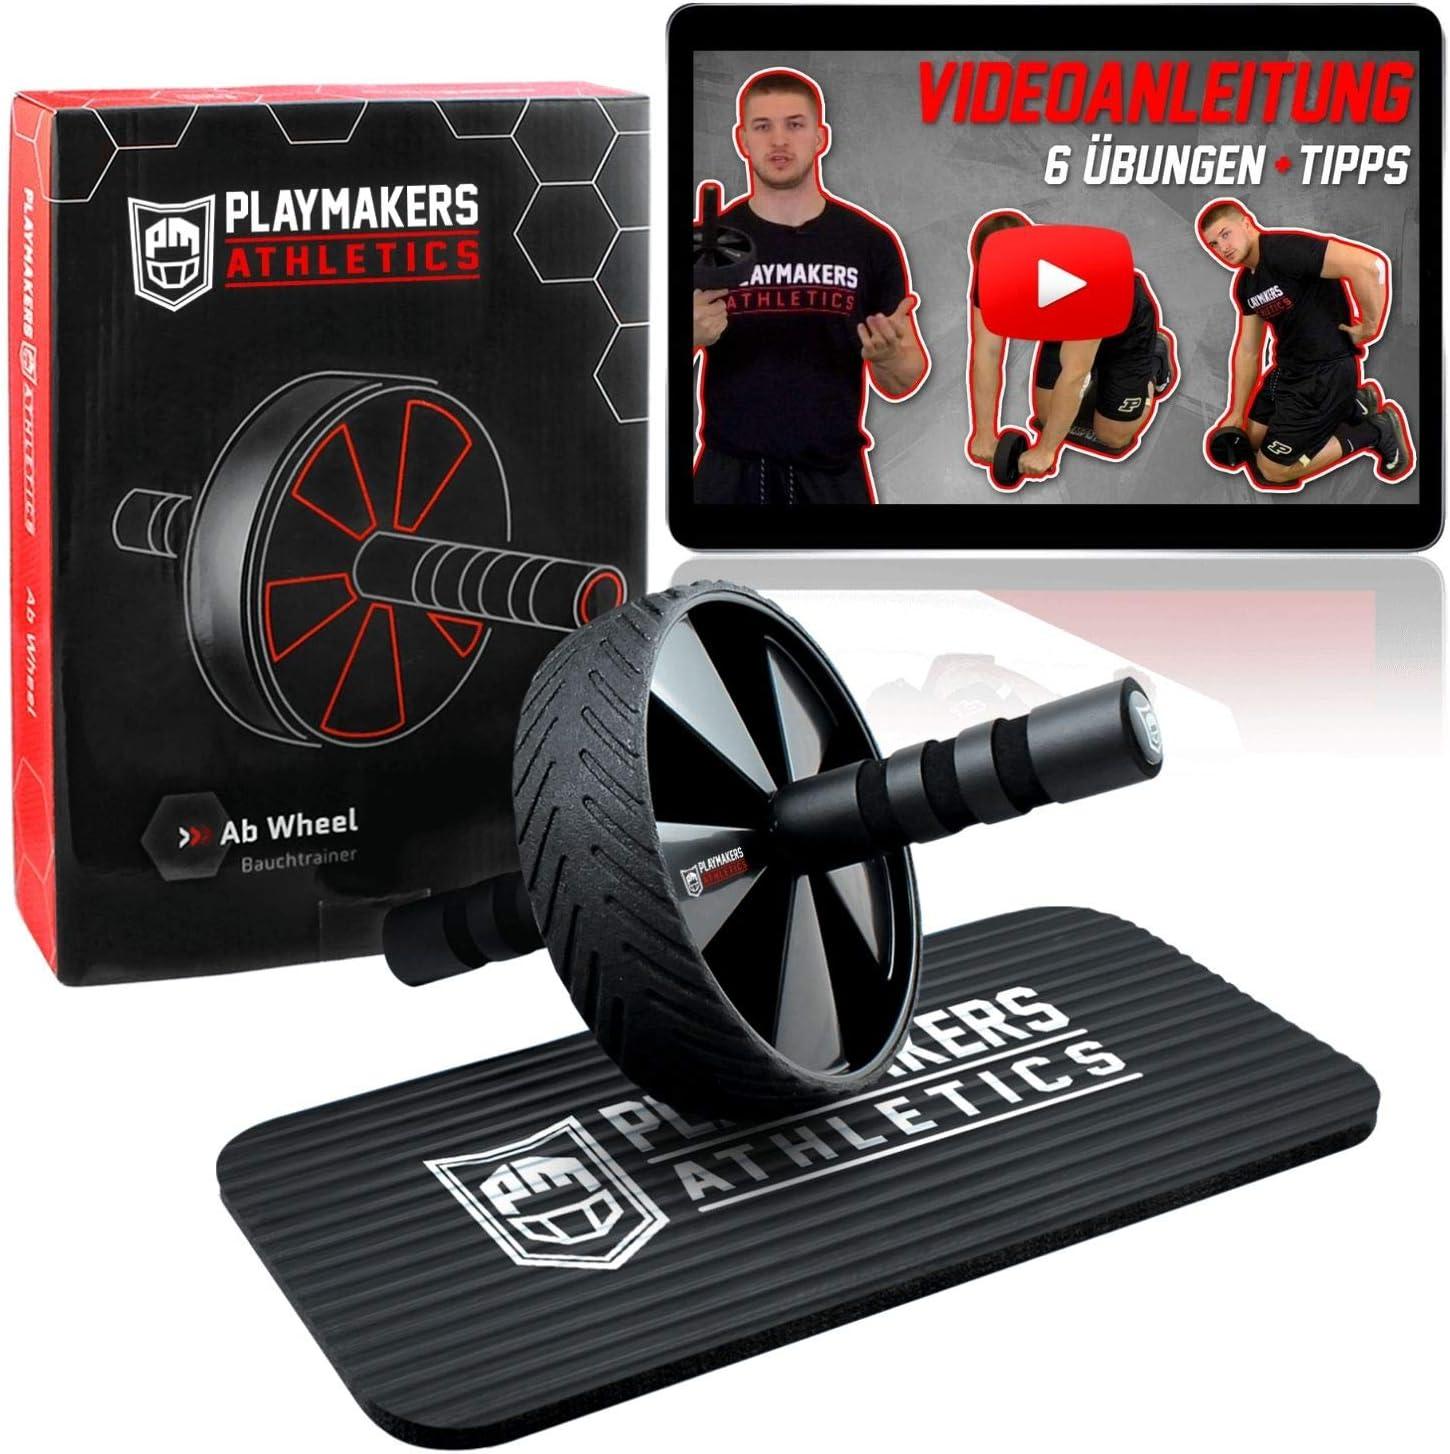 Bauchmuskeltrainer Bauchrad Fitnessgeräte Wheel Bauchroller Trainingsgeräte